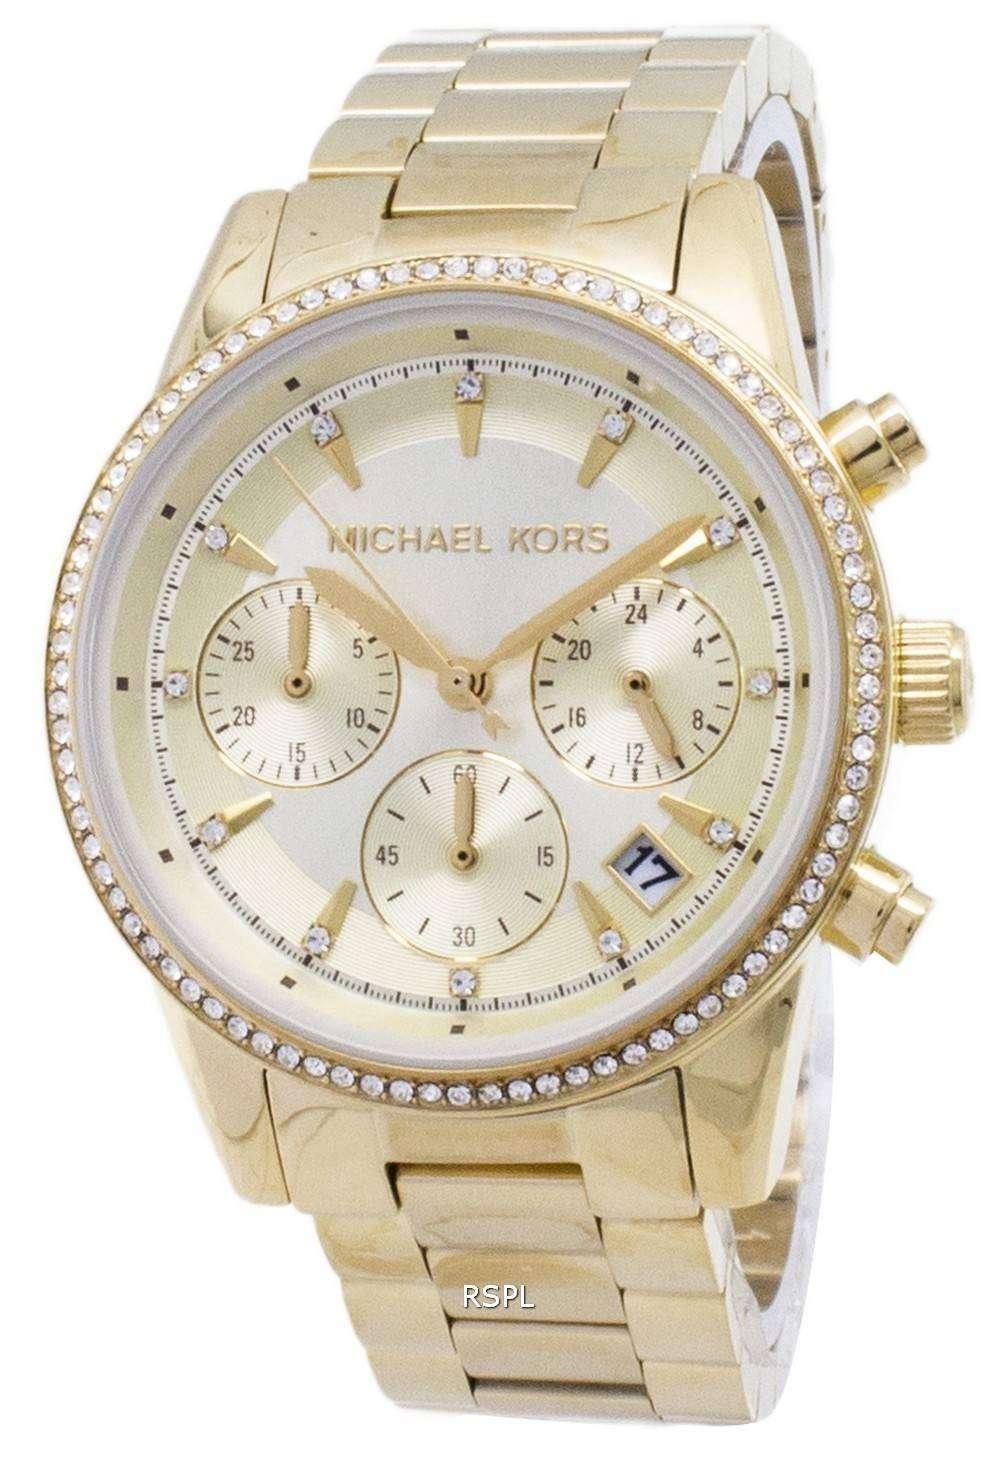 65b4b449d40a Michael Kors Ritz Chronograph Quartz Diamond Accents MK6356 Women s Watch